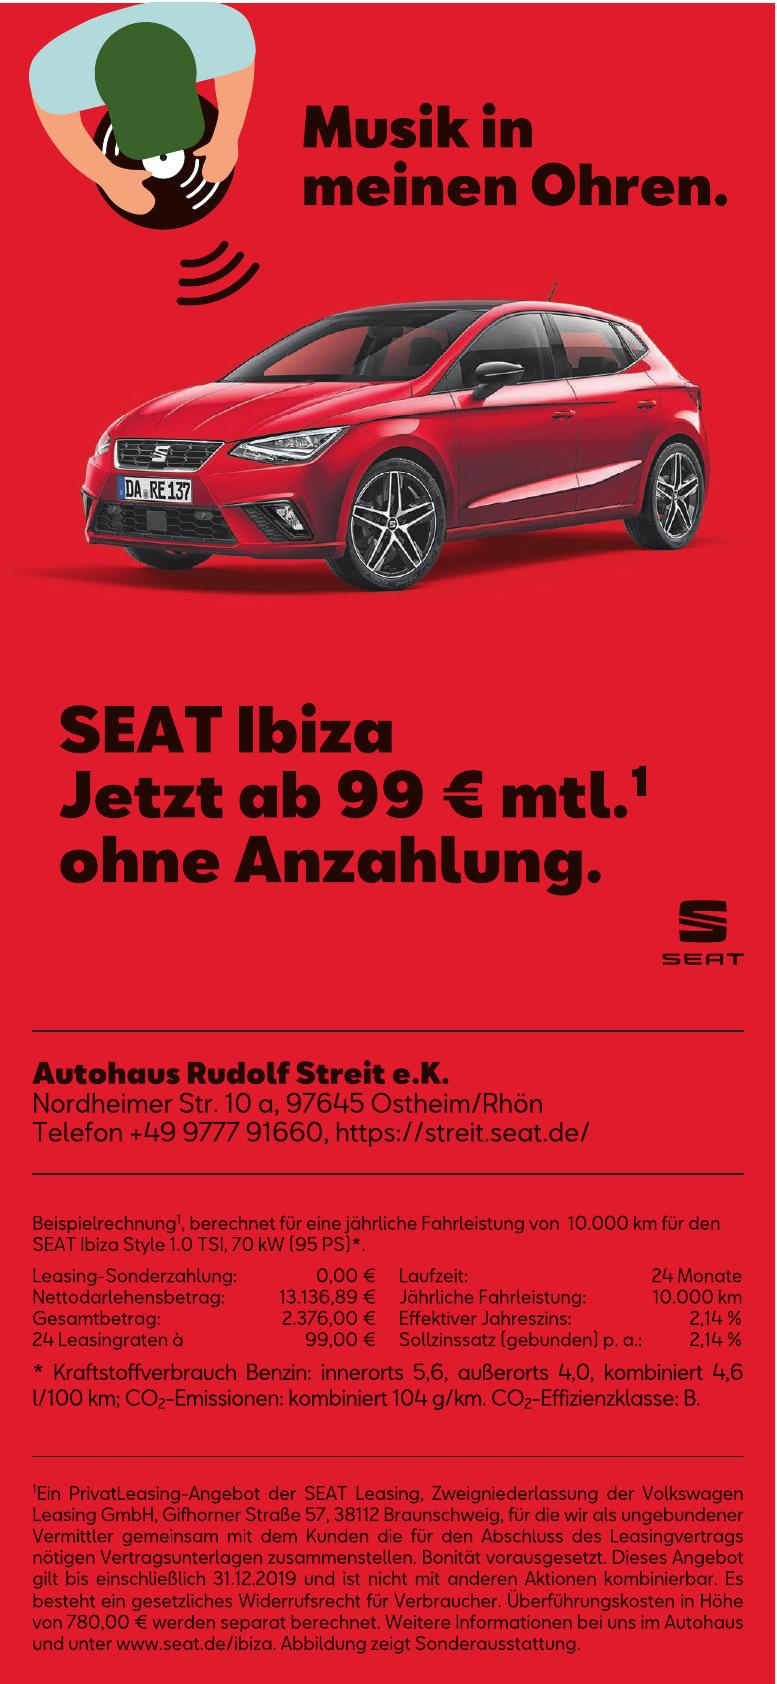 Autohaus Rudolf Streit e.K.